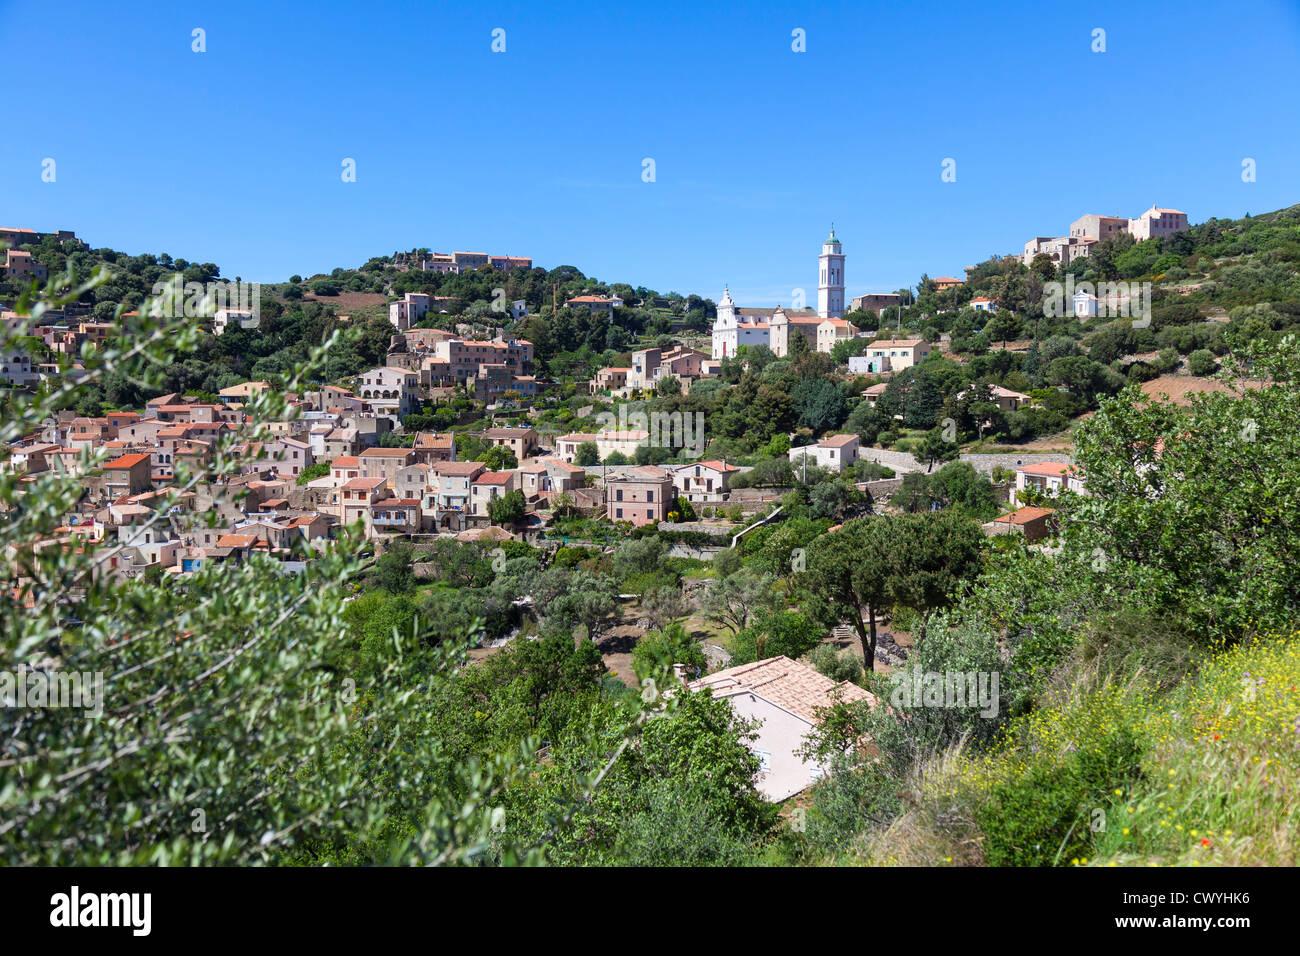 Mountain village in the hinterland of Calvi, Corsica, France - Stock Image